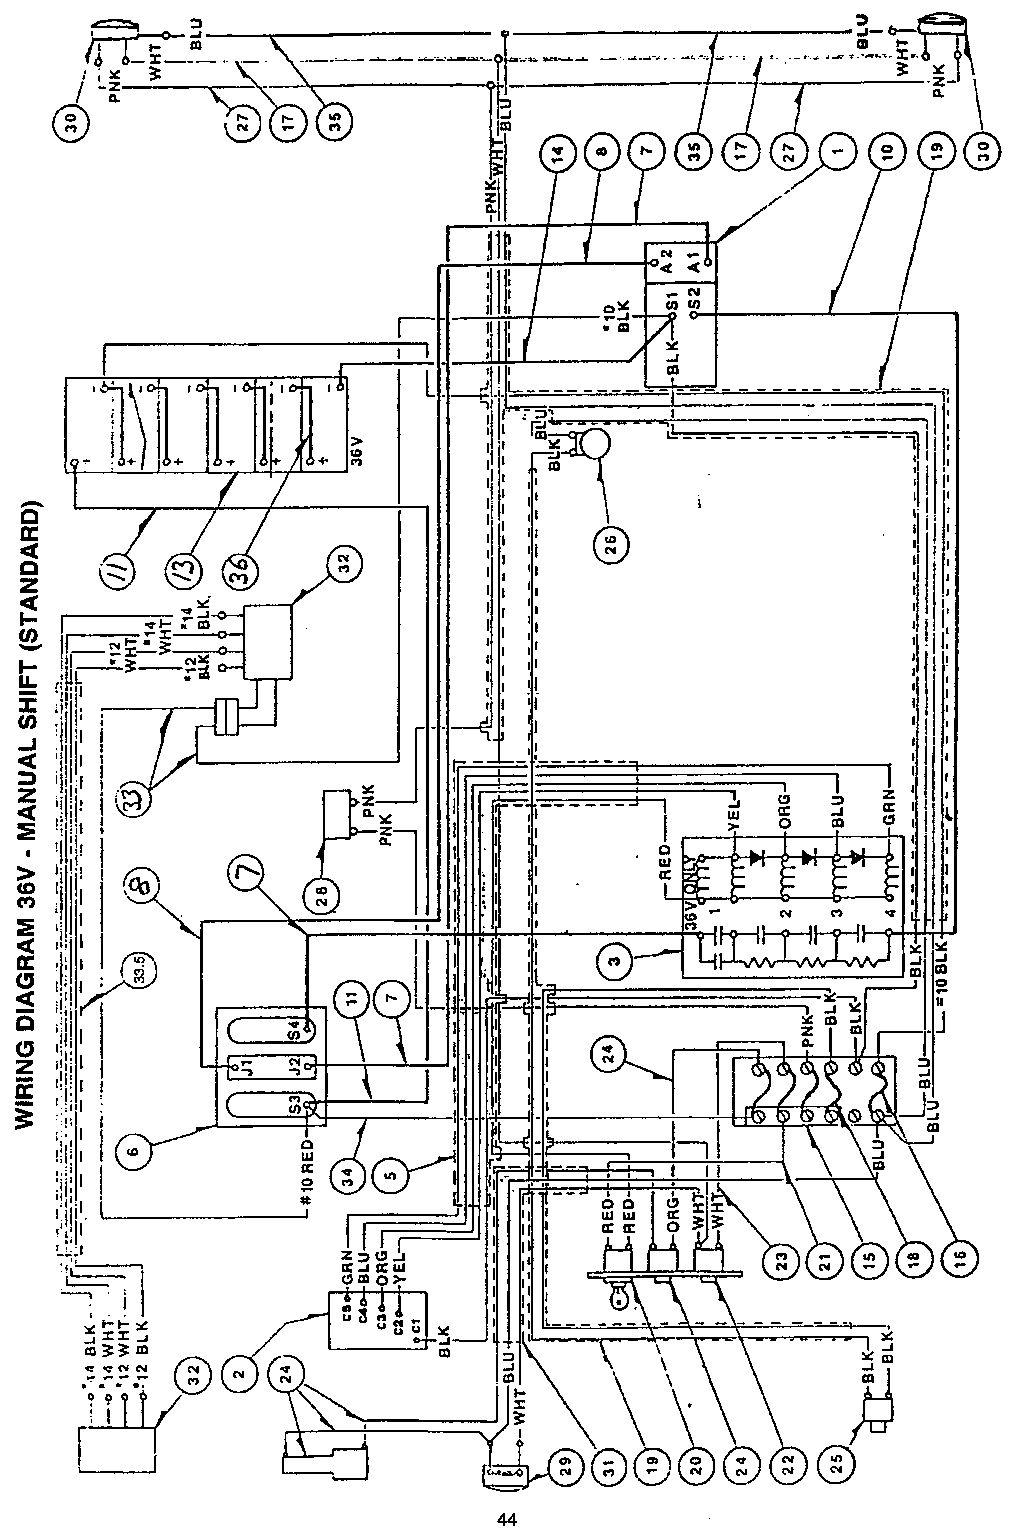 Ezgo Dcs Wiring Diagram Bmw E28 535i Wiring-diagram Jaguar ...  Ez Go Wiring Diagram on 1999 ez go wiring diagram, 2008 ez go wiring diagram, 1995 ez go wiring diagram, 1996 ez go wiring diagram, 2007 ez go wiring diagram, 1992 ez go wiring diagram, ez go cart wiring diagram, electric ez go wiring diagram, 2005 ez go wiring diagram, 98 ez go wiring diagram, 1984 ez go wiring diagram, 1998 ez go wiring diagram, 48 volt ez go wiring diagram, 1985 ez go wiring diagram, 2004 ez go wiring diagram, 2001 ez go wiring diagram, ez go charger wiring diagram, 2006 ez go wiring diagram, 1997 ez go wiring diagram, ez go solenoid wiring diagram,